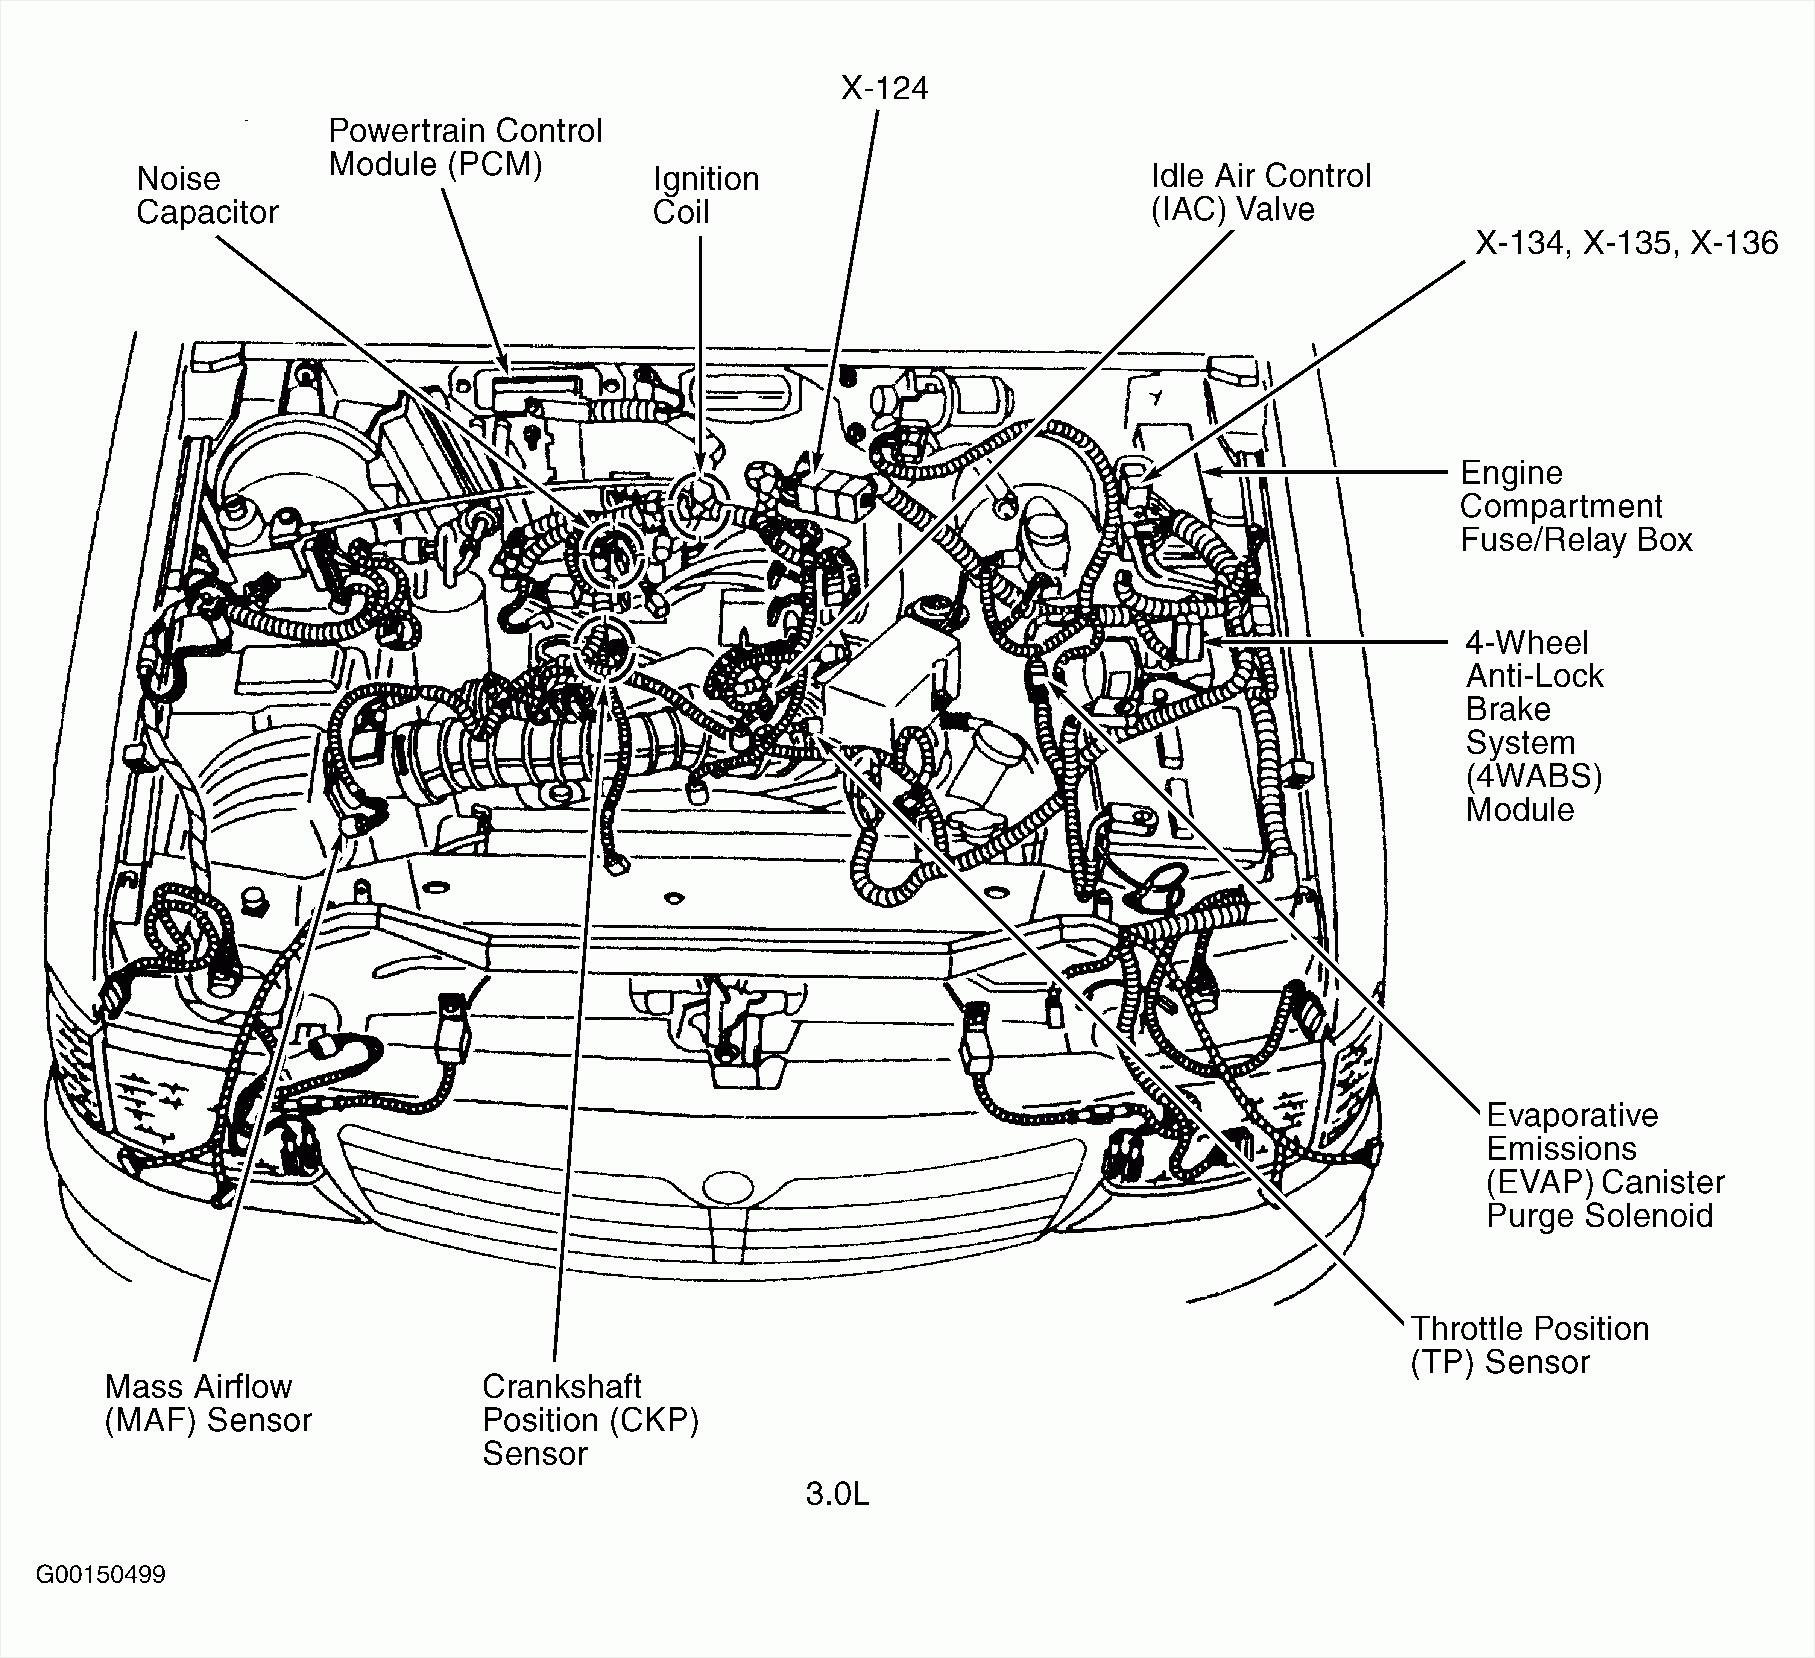 2006 Vw Passat Engine Diagram 2008 Jetta Wiring Diagram Wiring Diagram Datasource Of 2006 Vw Passat Engine Diagram